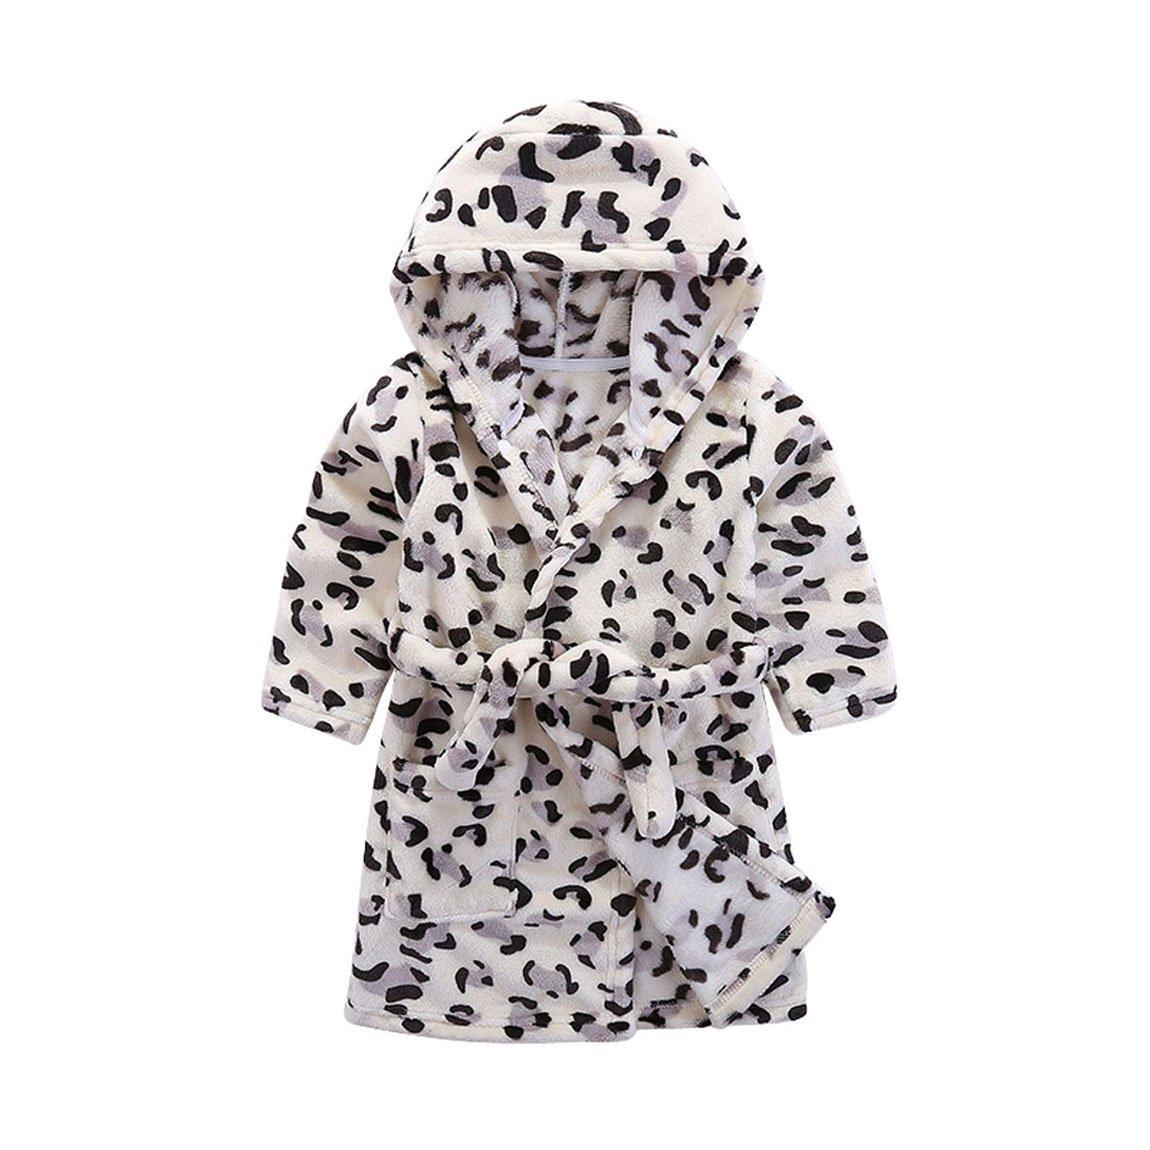 Kids Soft Hooded Bathrobe Toddler Robe Childrens Pajamas Boys Girls Sleepwear